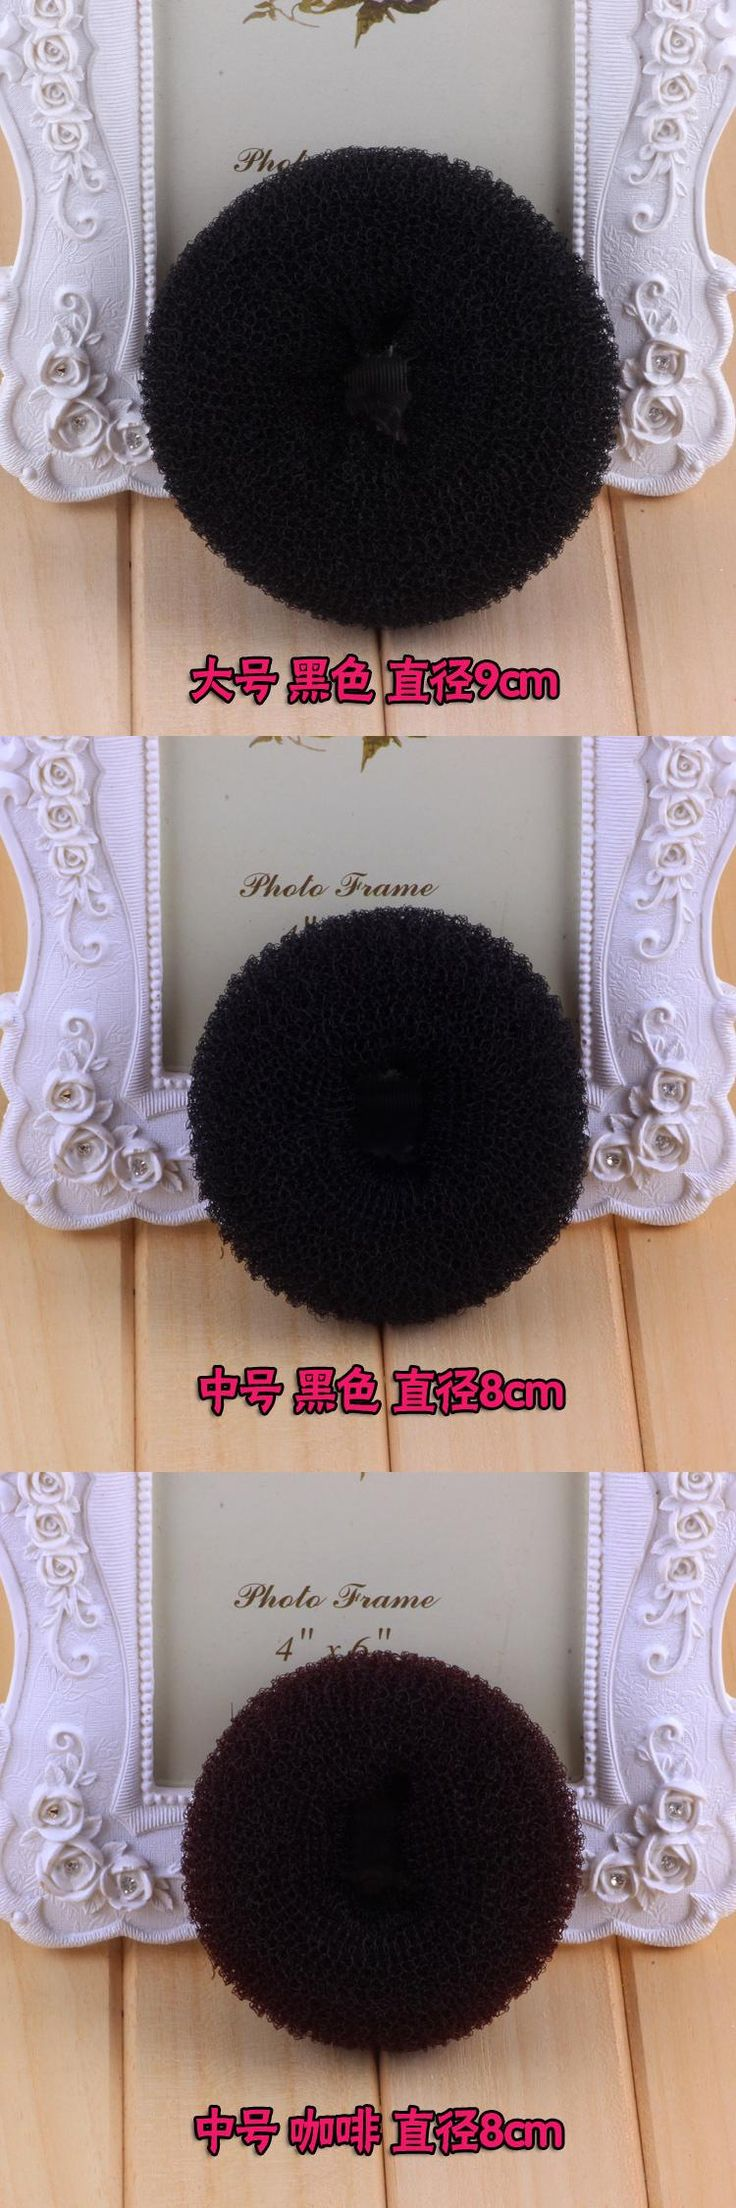 [Visit to Buy] Cute Women Girls Sponge Bract head meatball head Hair Bun Maker Ring Donut Shape Hairband Hair styling Tool 100% Top Good #Advertisement